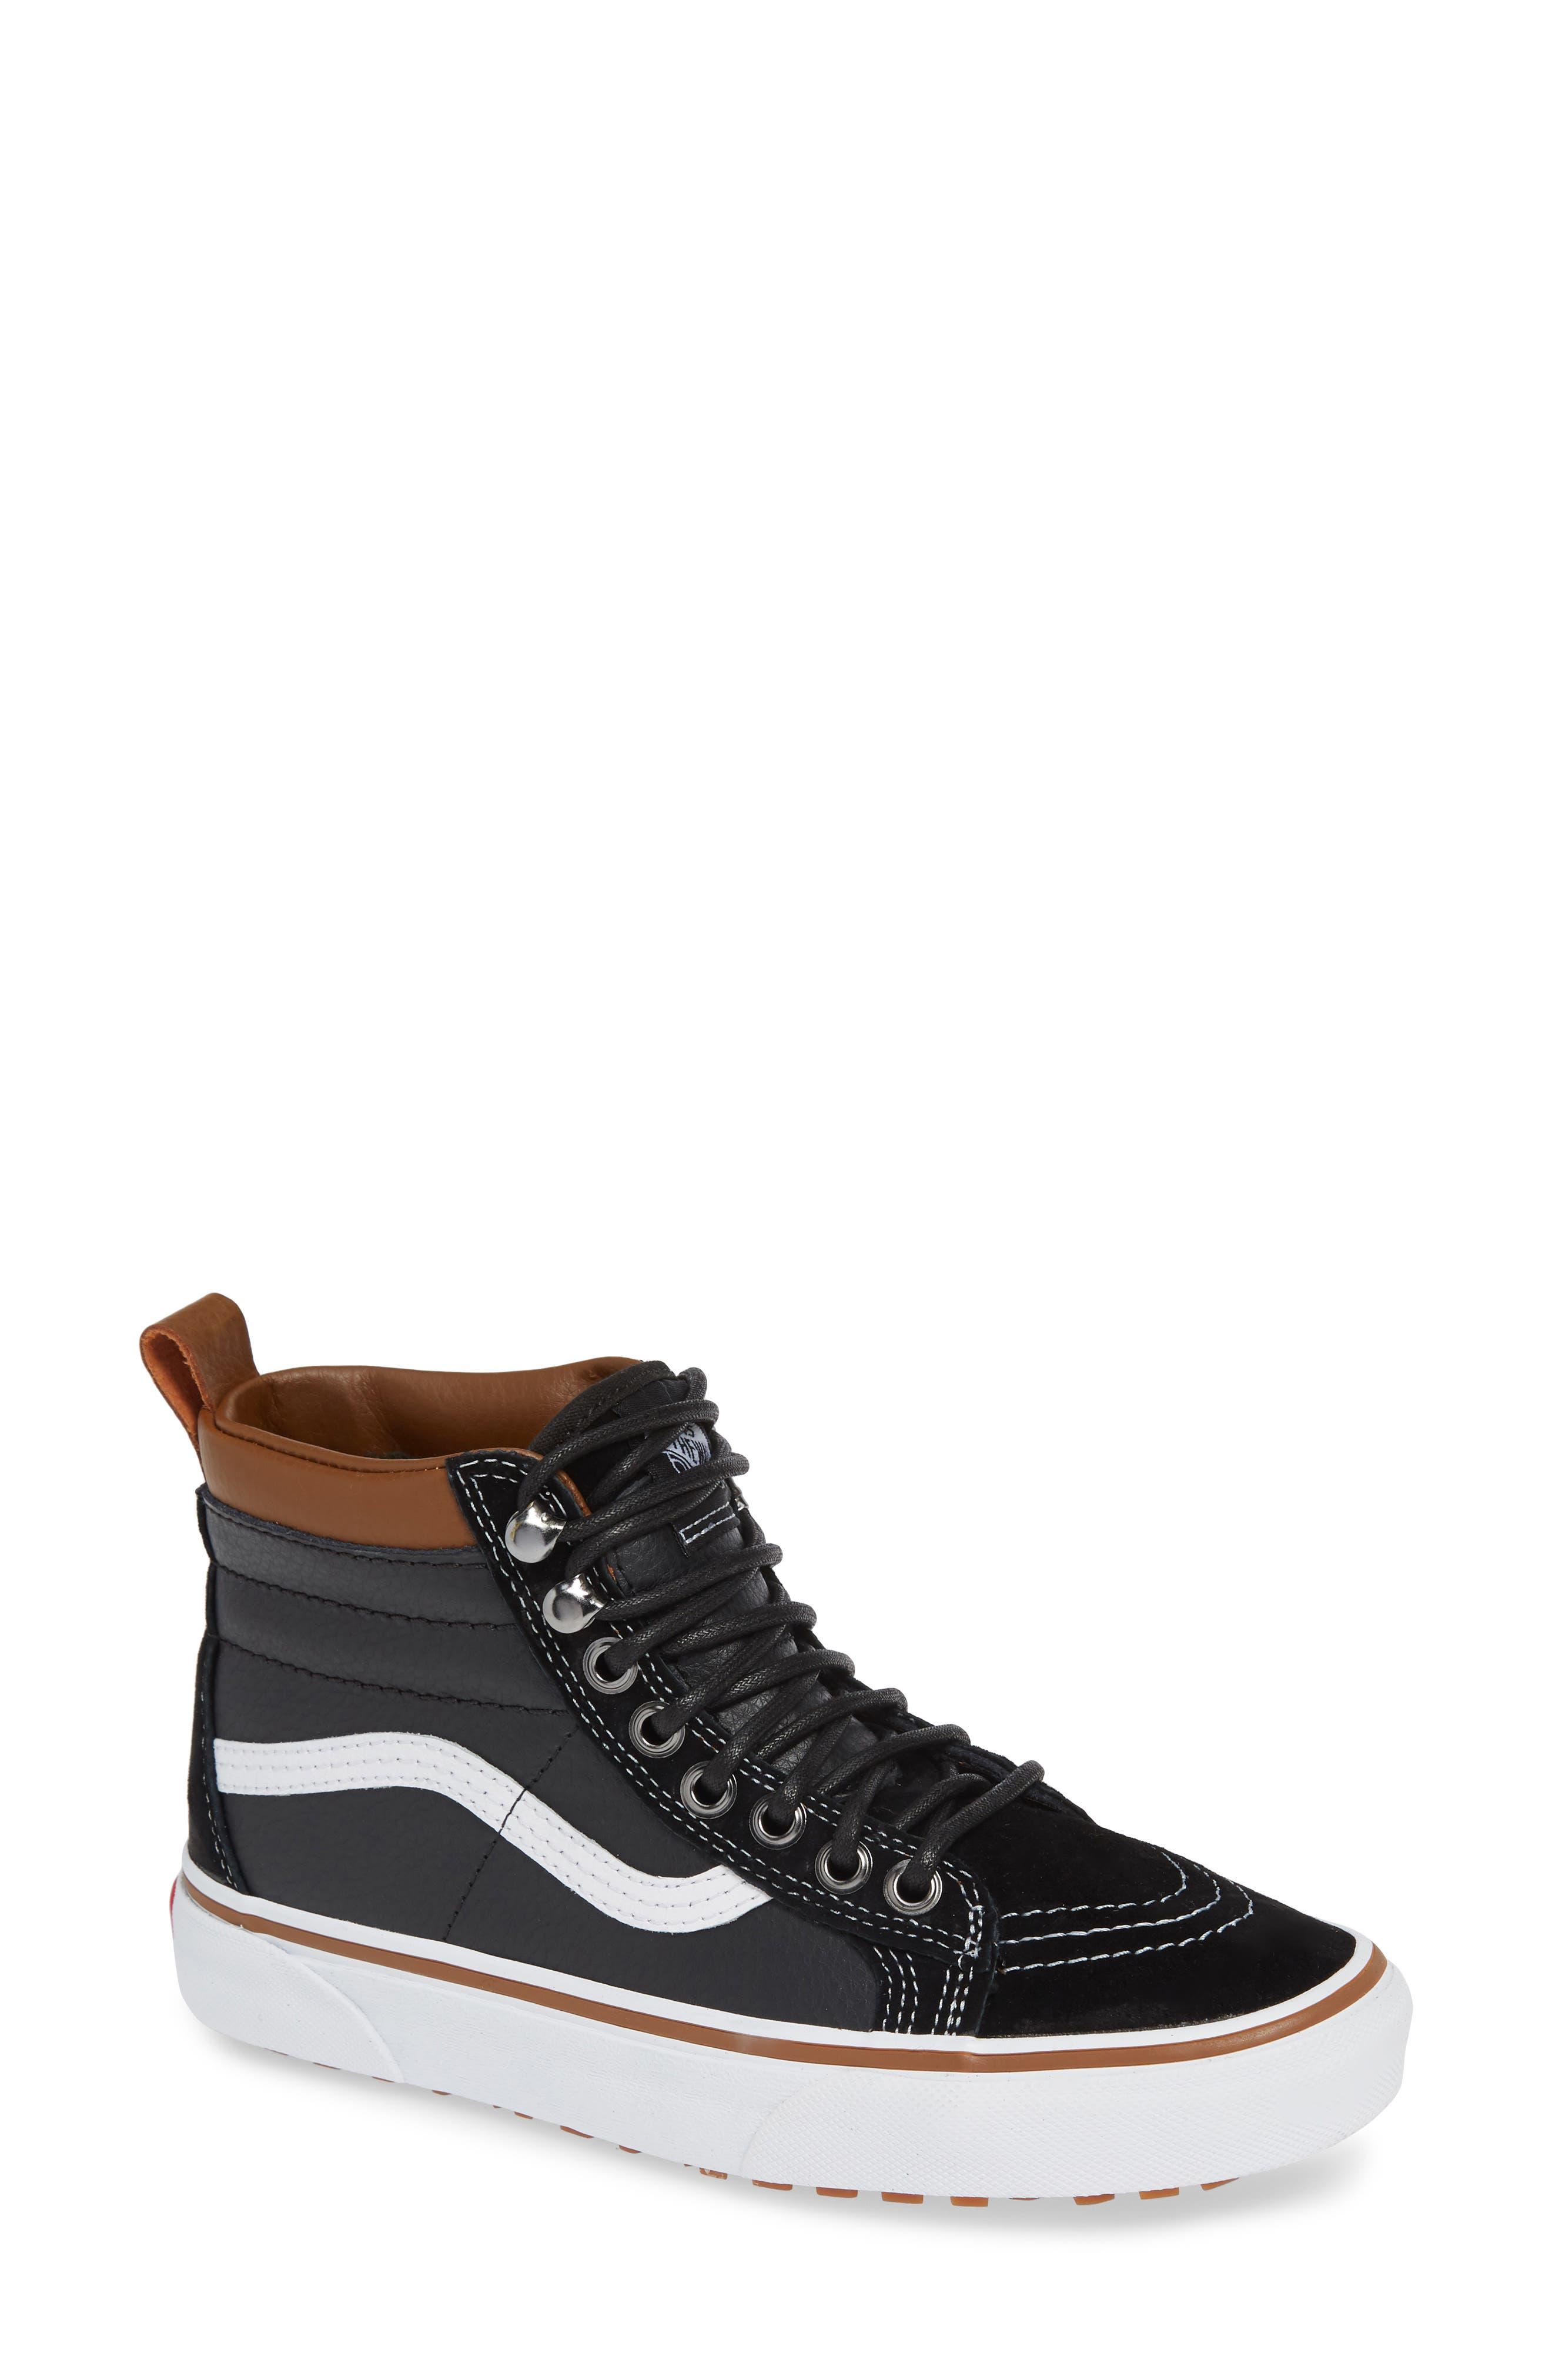 Sk-8 Hi MTE Sneaker,                         Main,                         color, LEATHER/ BLACK/ TRUE WHITE